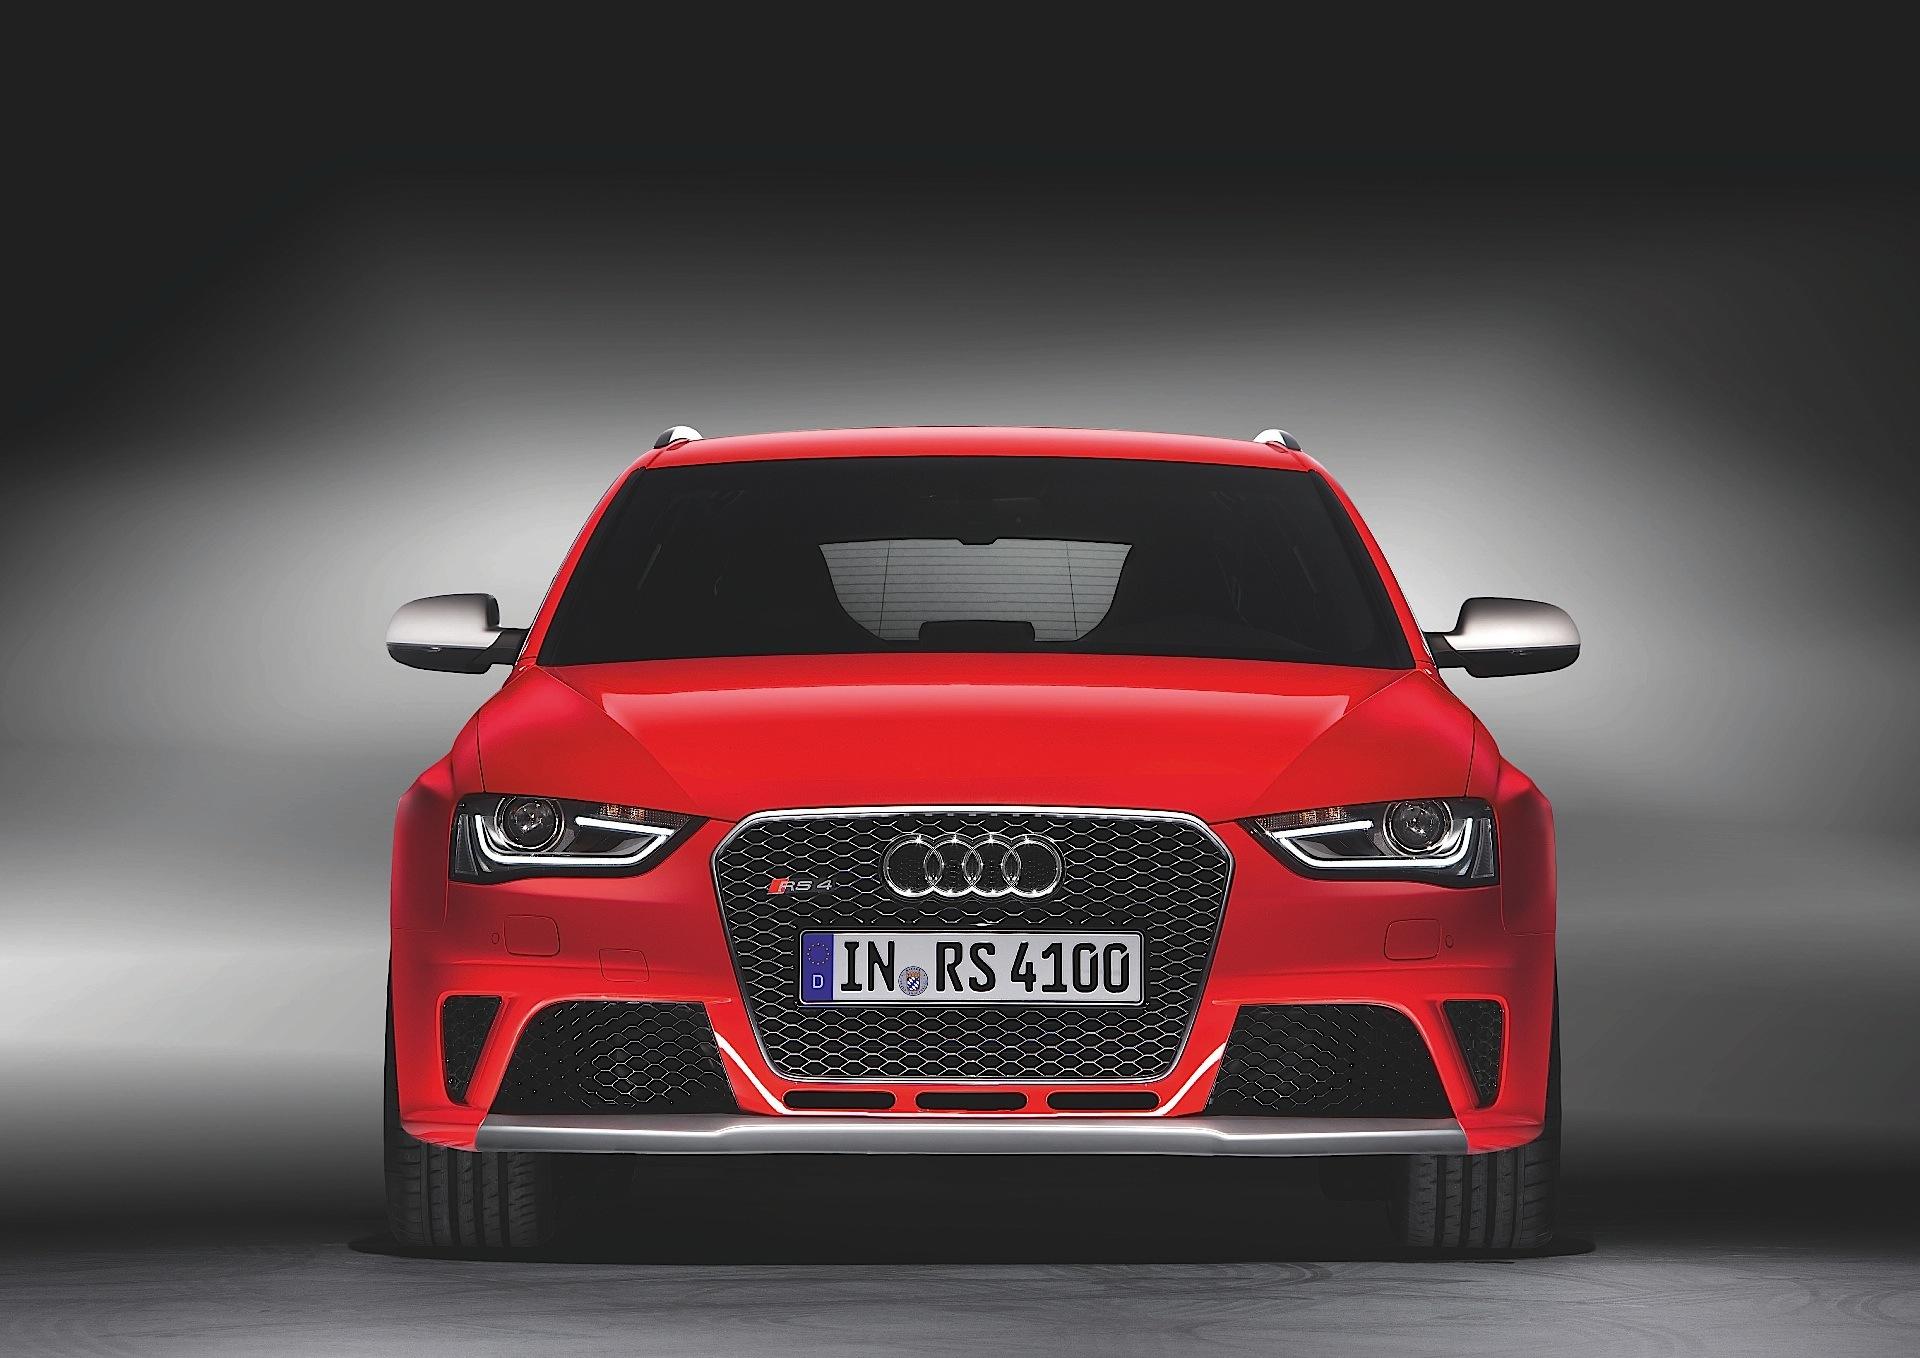 AUDI RS4 Avant (B8) specs - 2012, 2013, 2014, 2015 - autoevolution